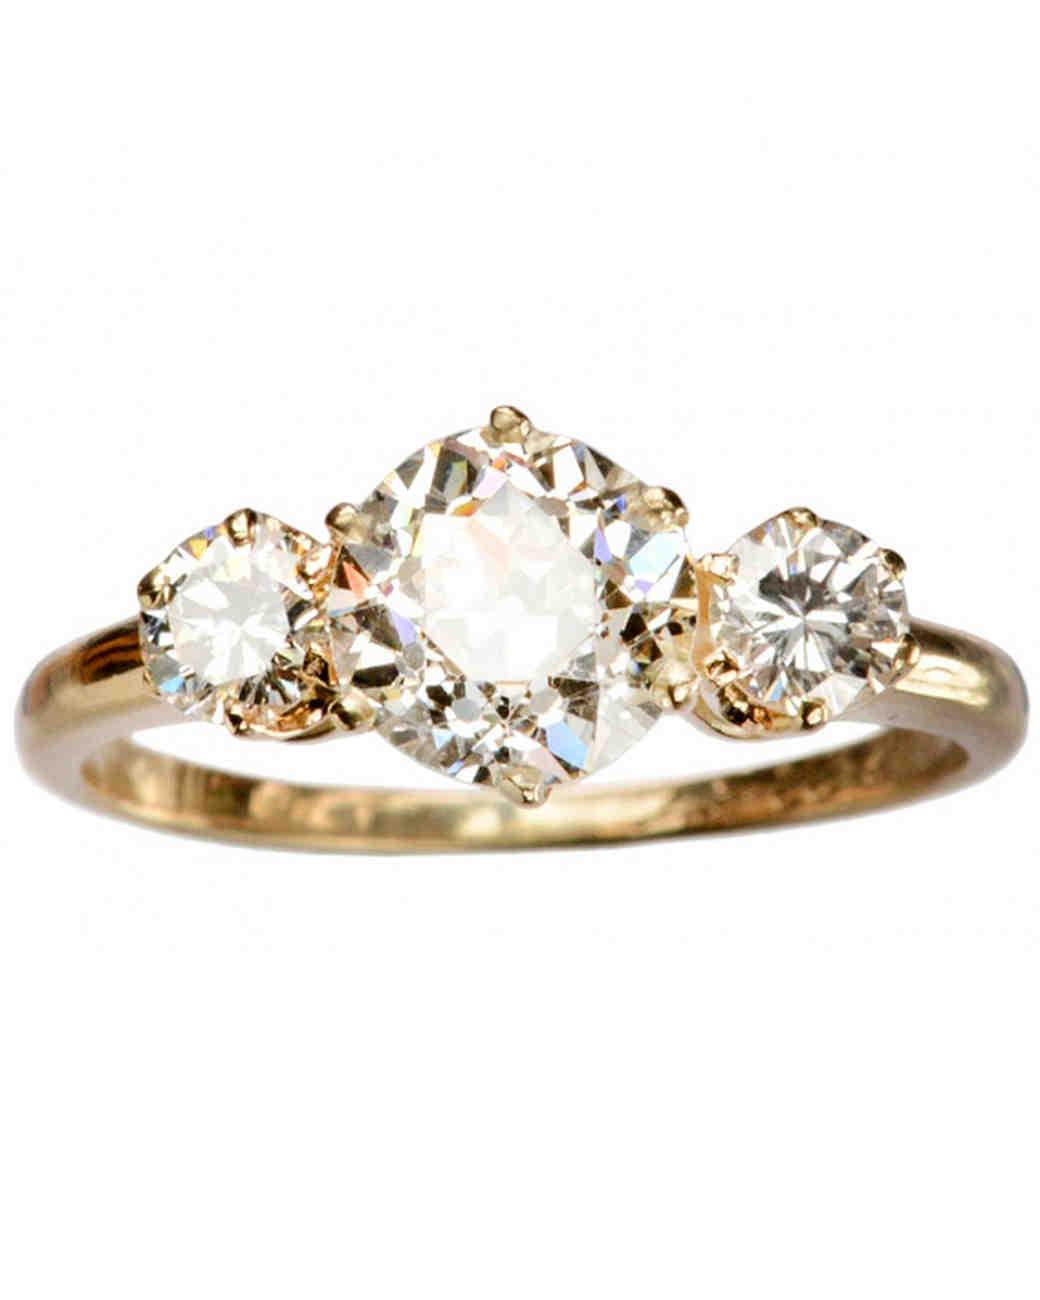 Erie Basin 1957 antique engagement ring